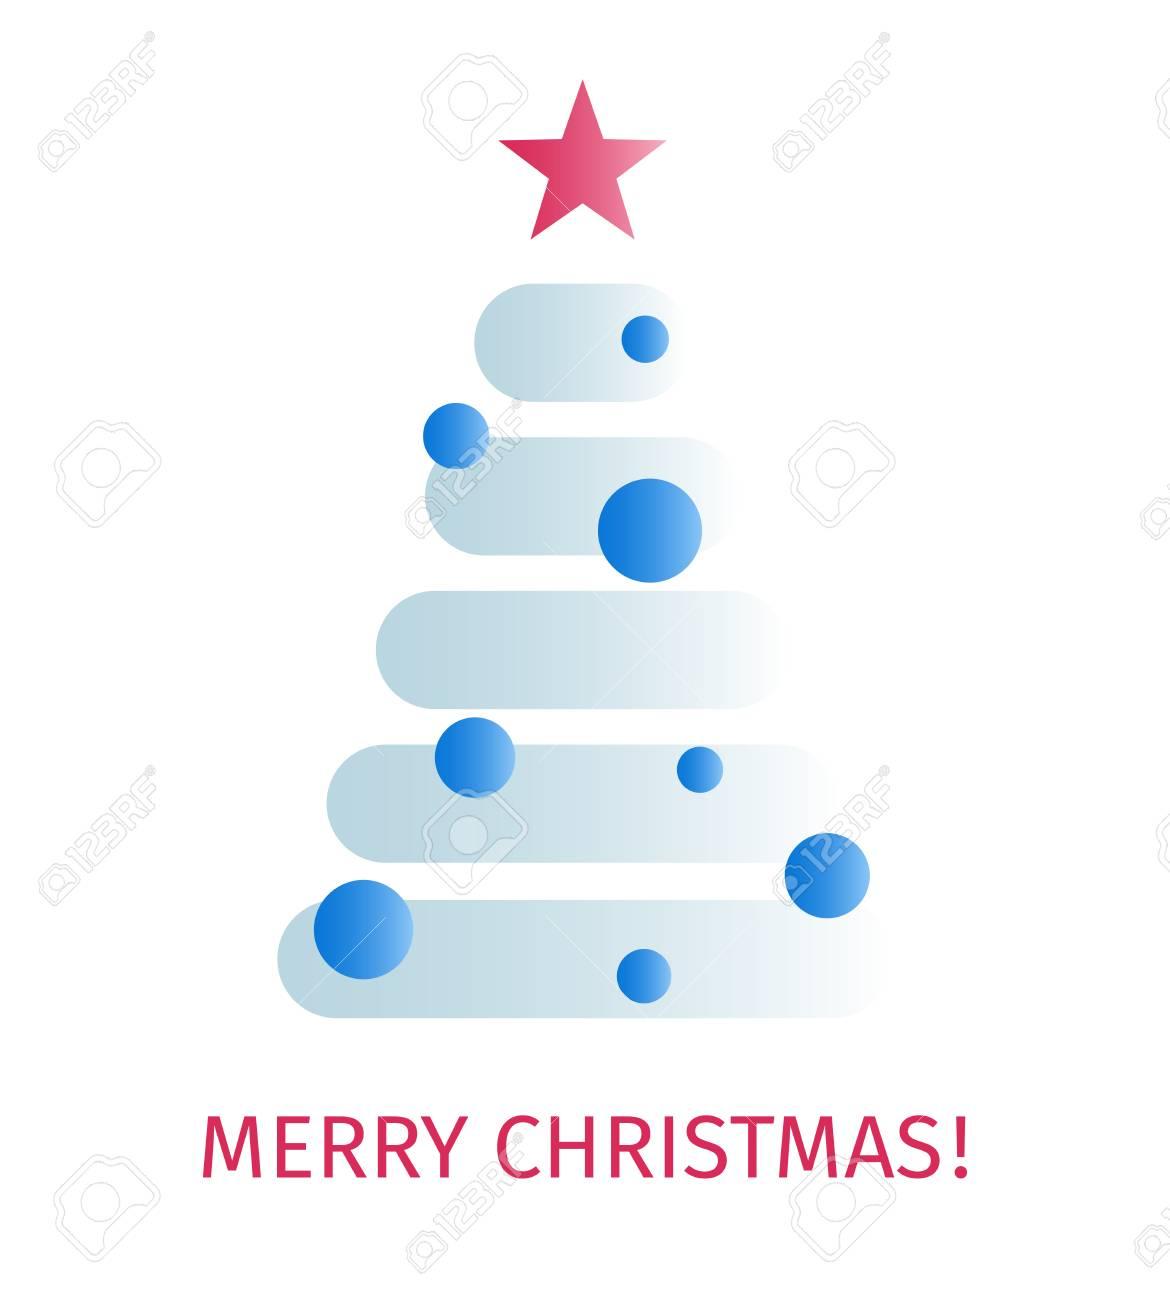 Congratulations On Christmas Stylized Christmas Tree Merry